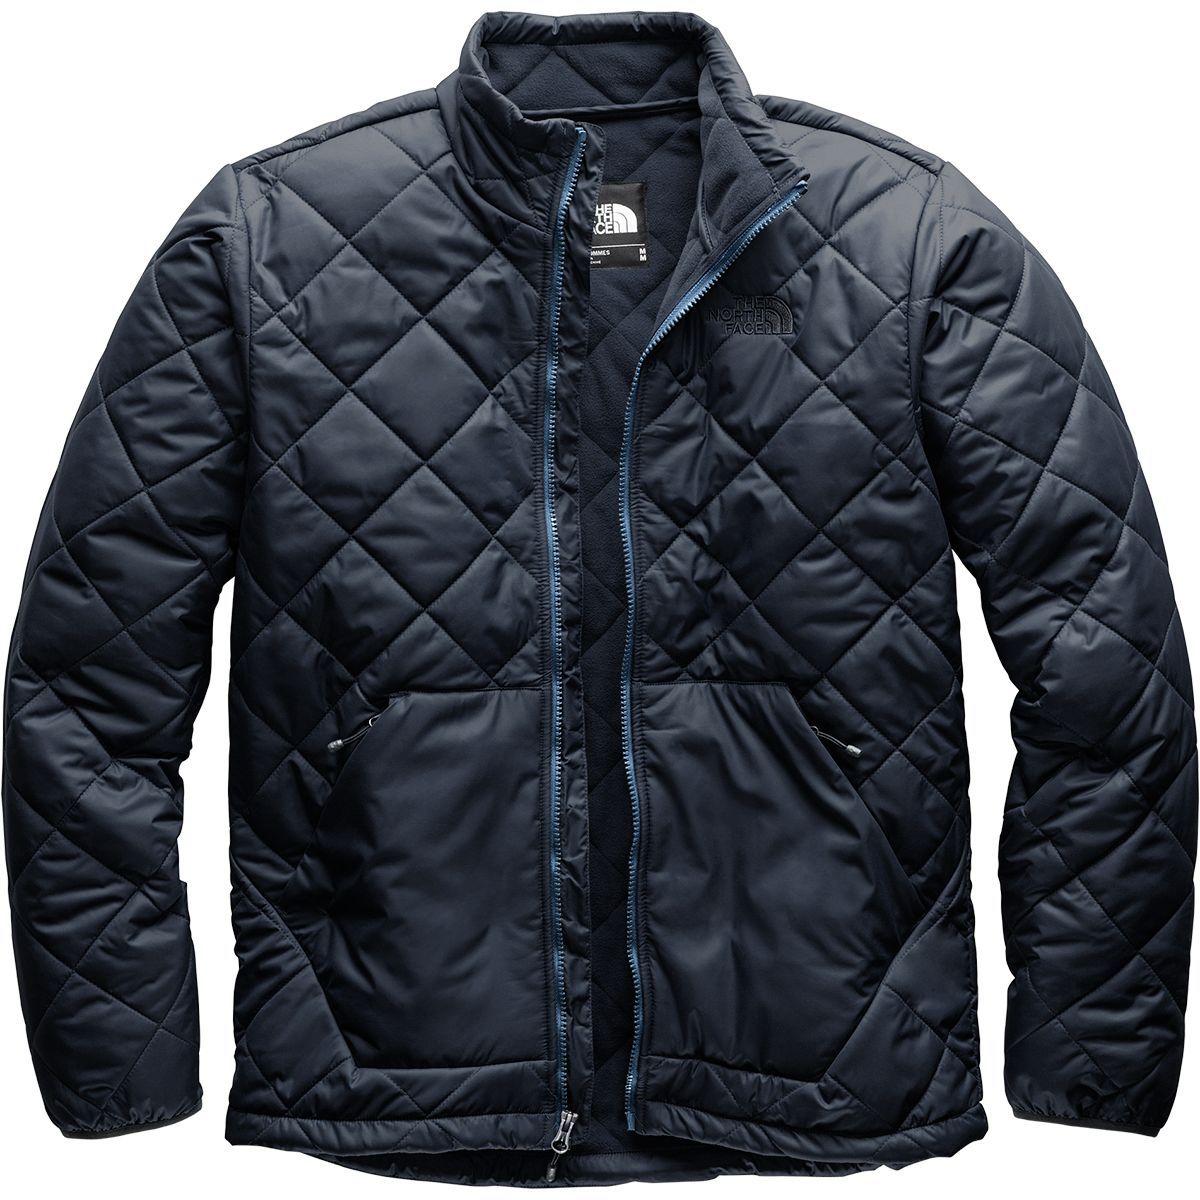 e6e5dc591 The North Face Cervas Jacket - Men's | Clothing | Jackets, Winter ...